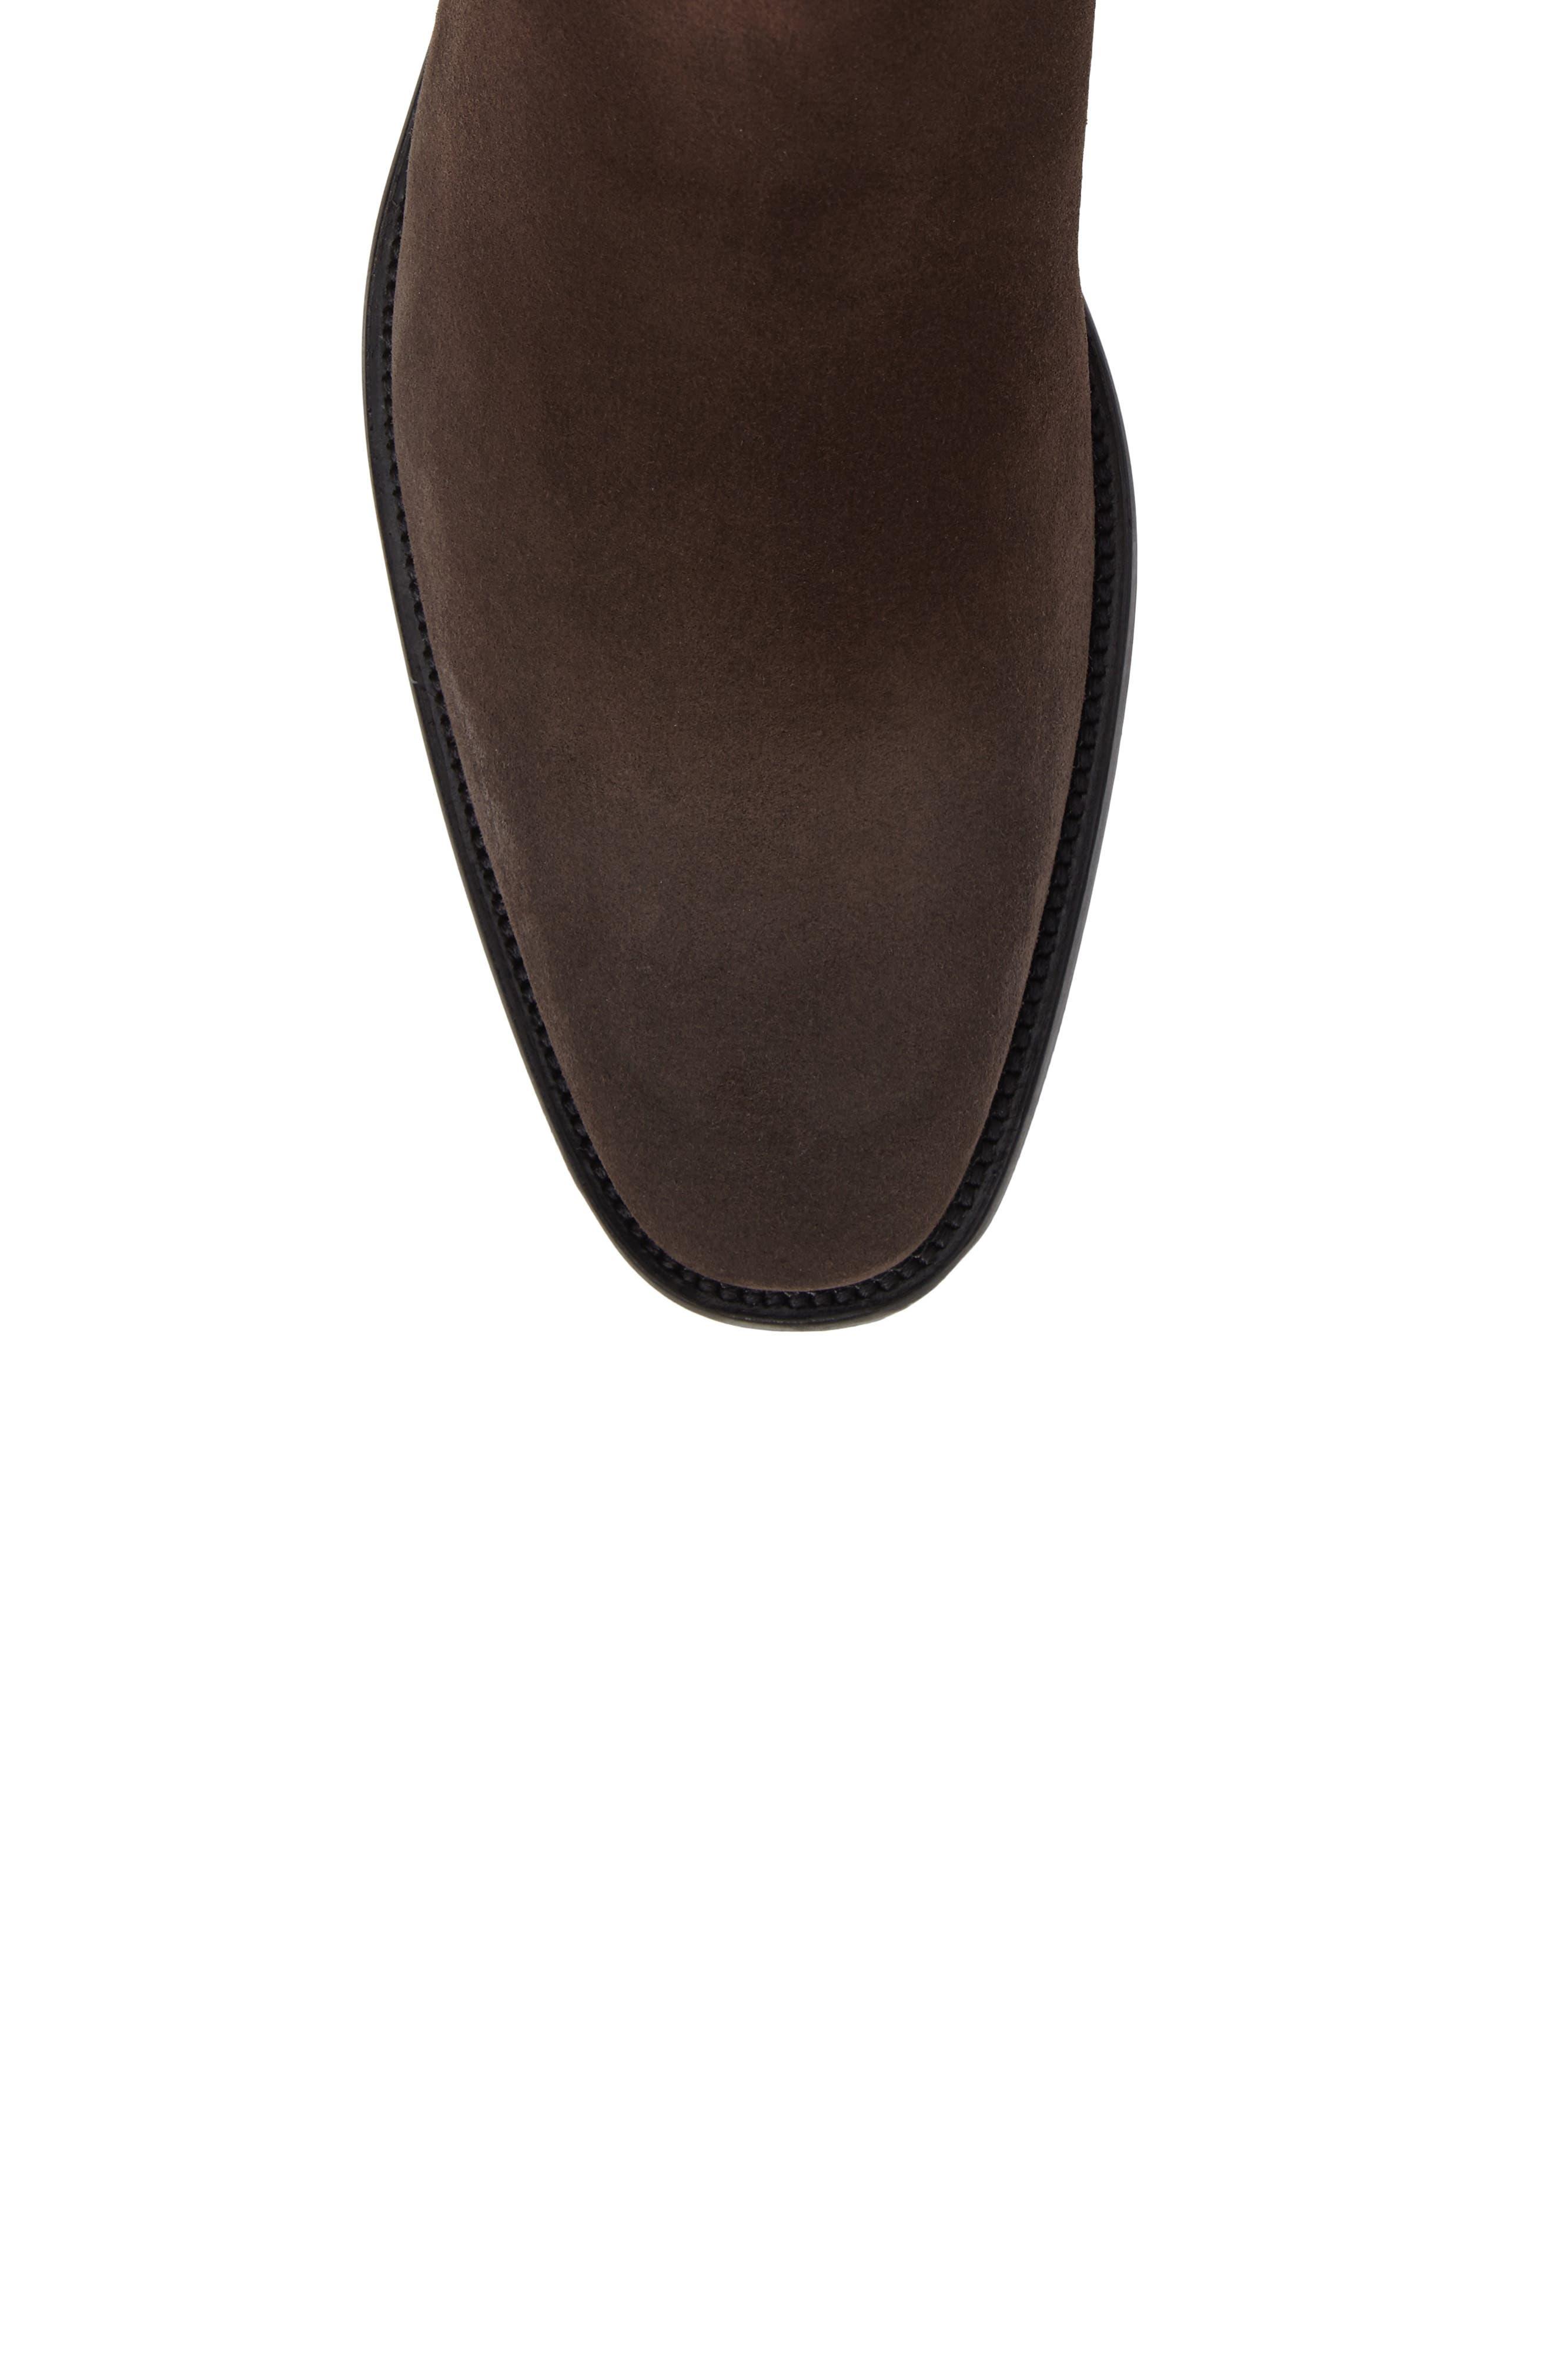 Vianello Chelsea Boot,                             Alternate thumbnail 5, color,                             021